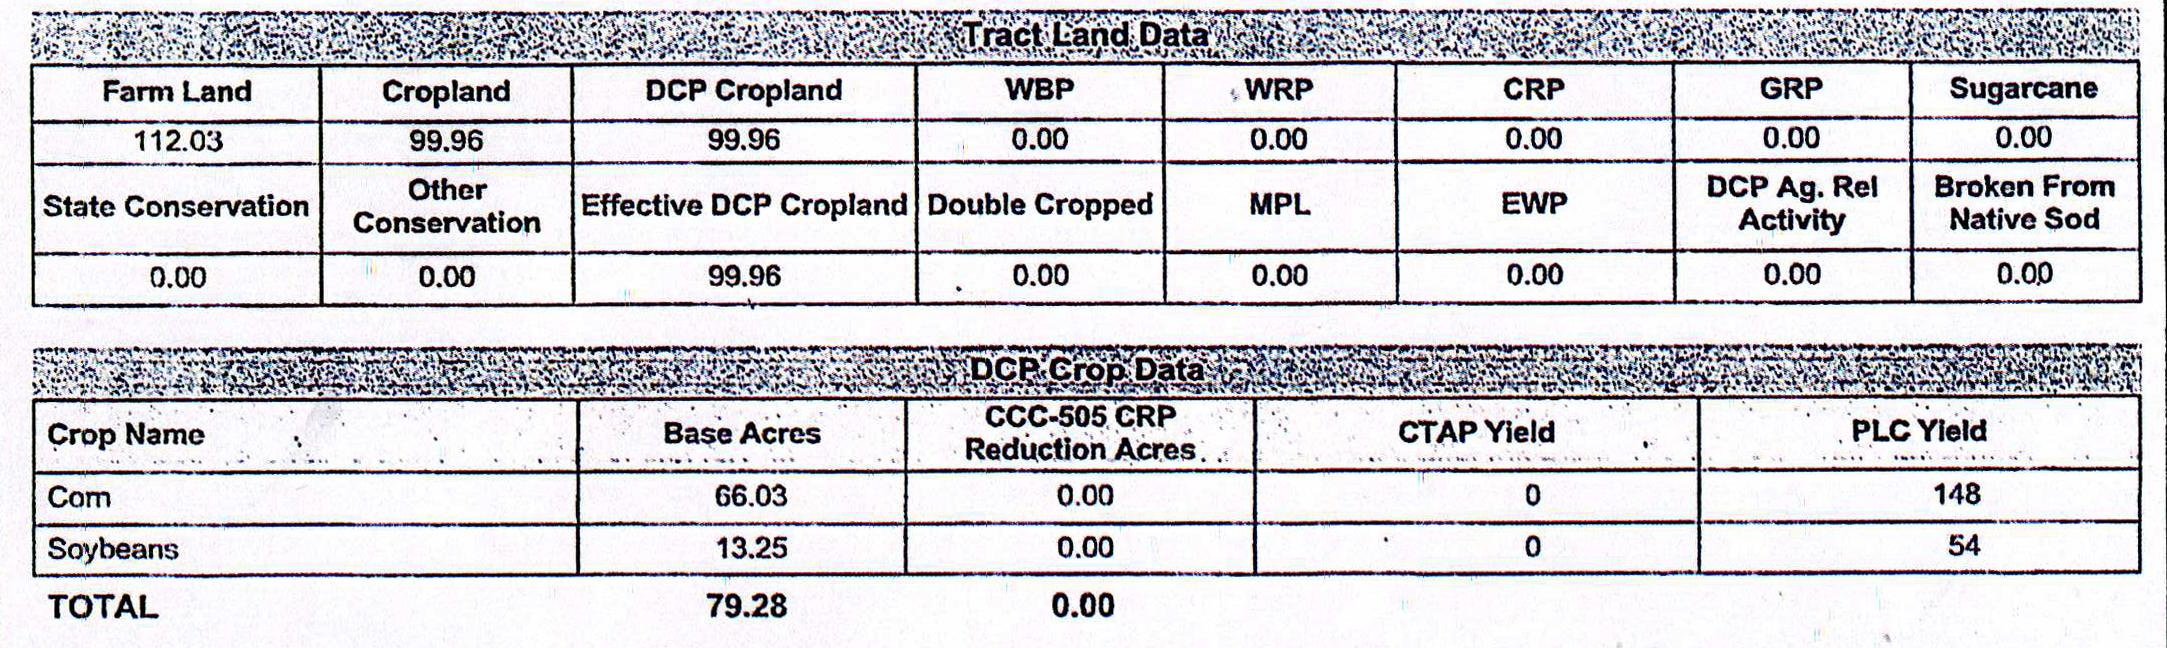 Crop Info_BIR-1000